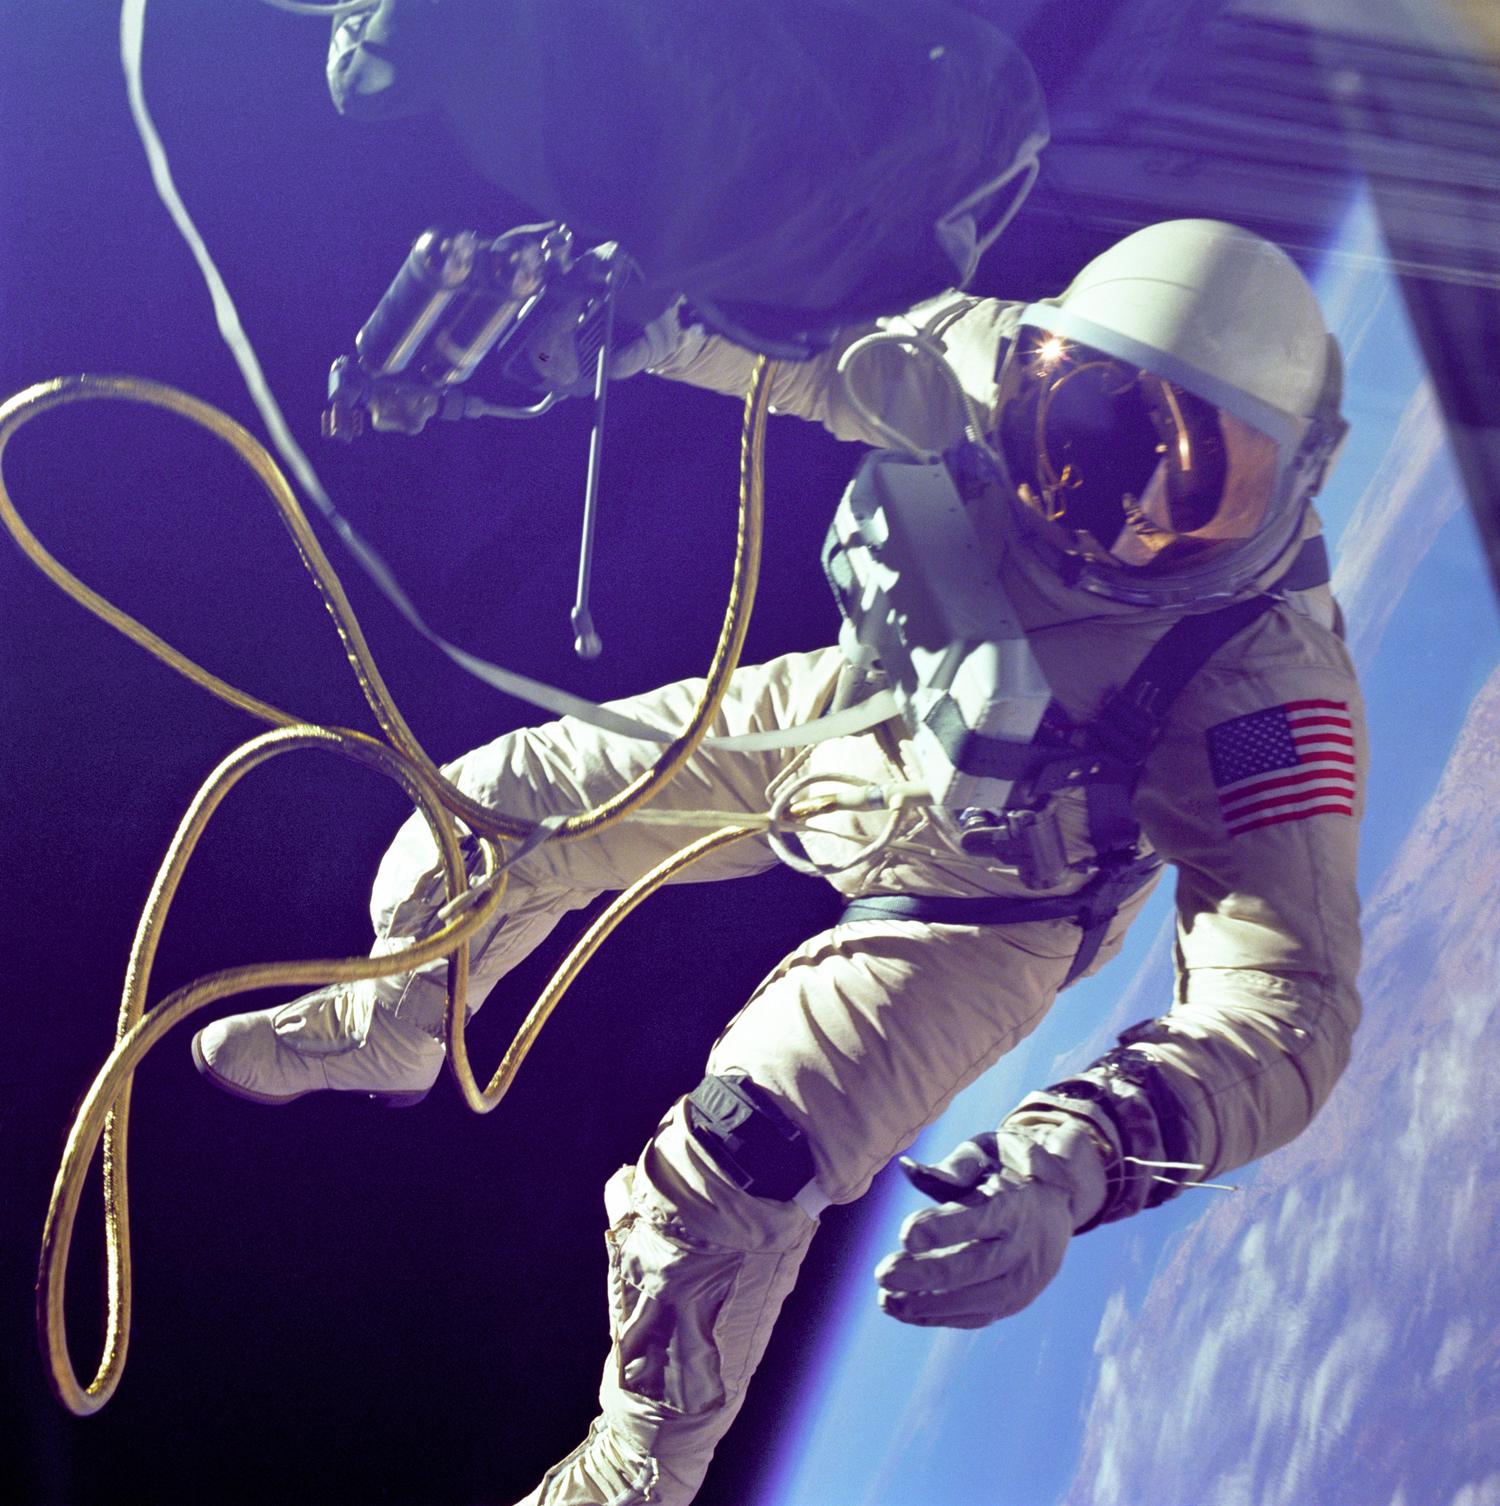 soviet space program ed white - photo #17